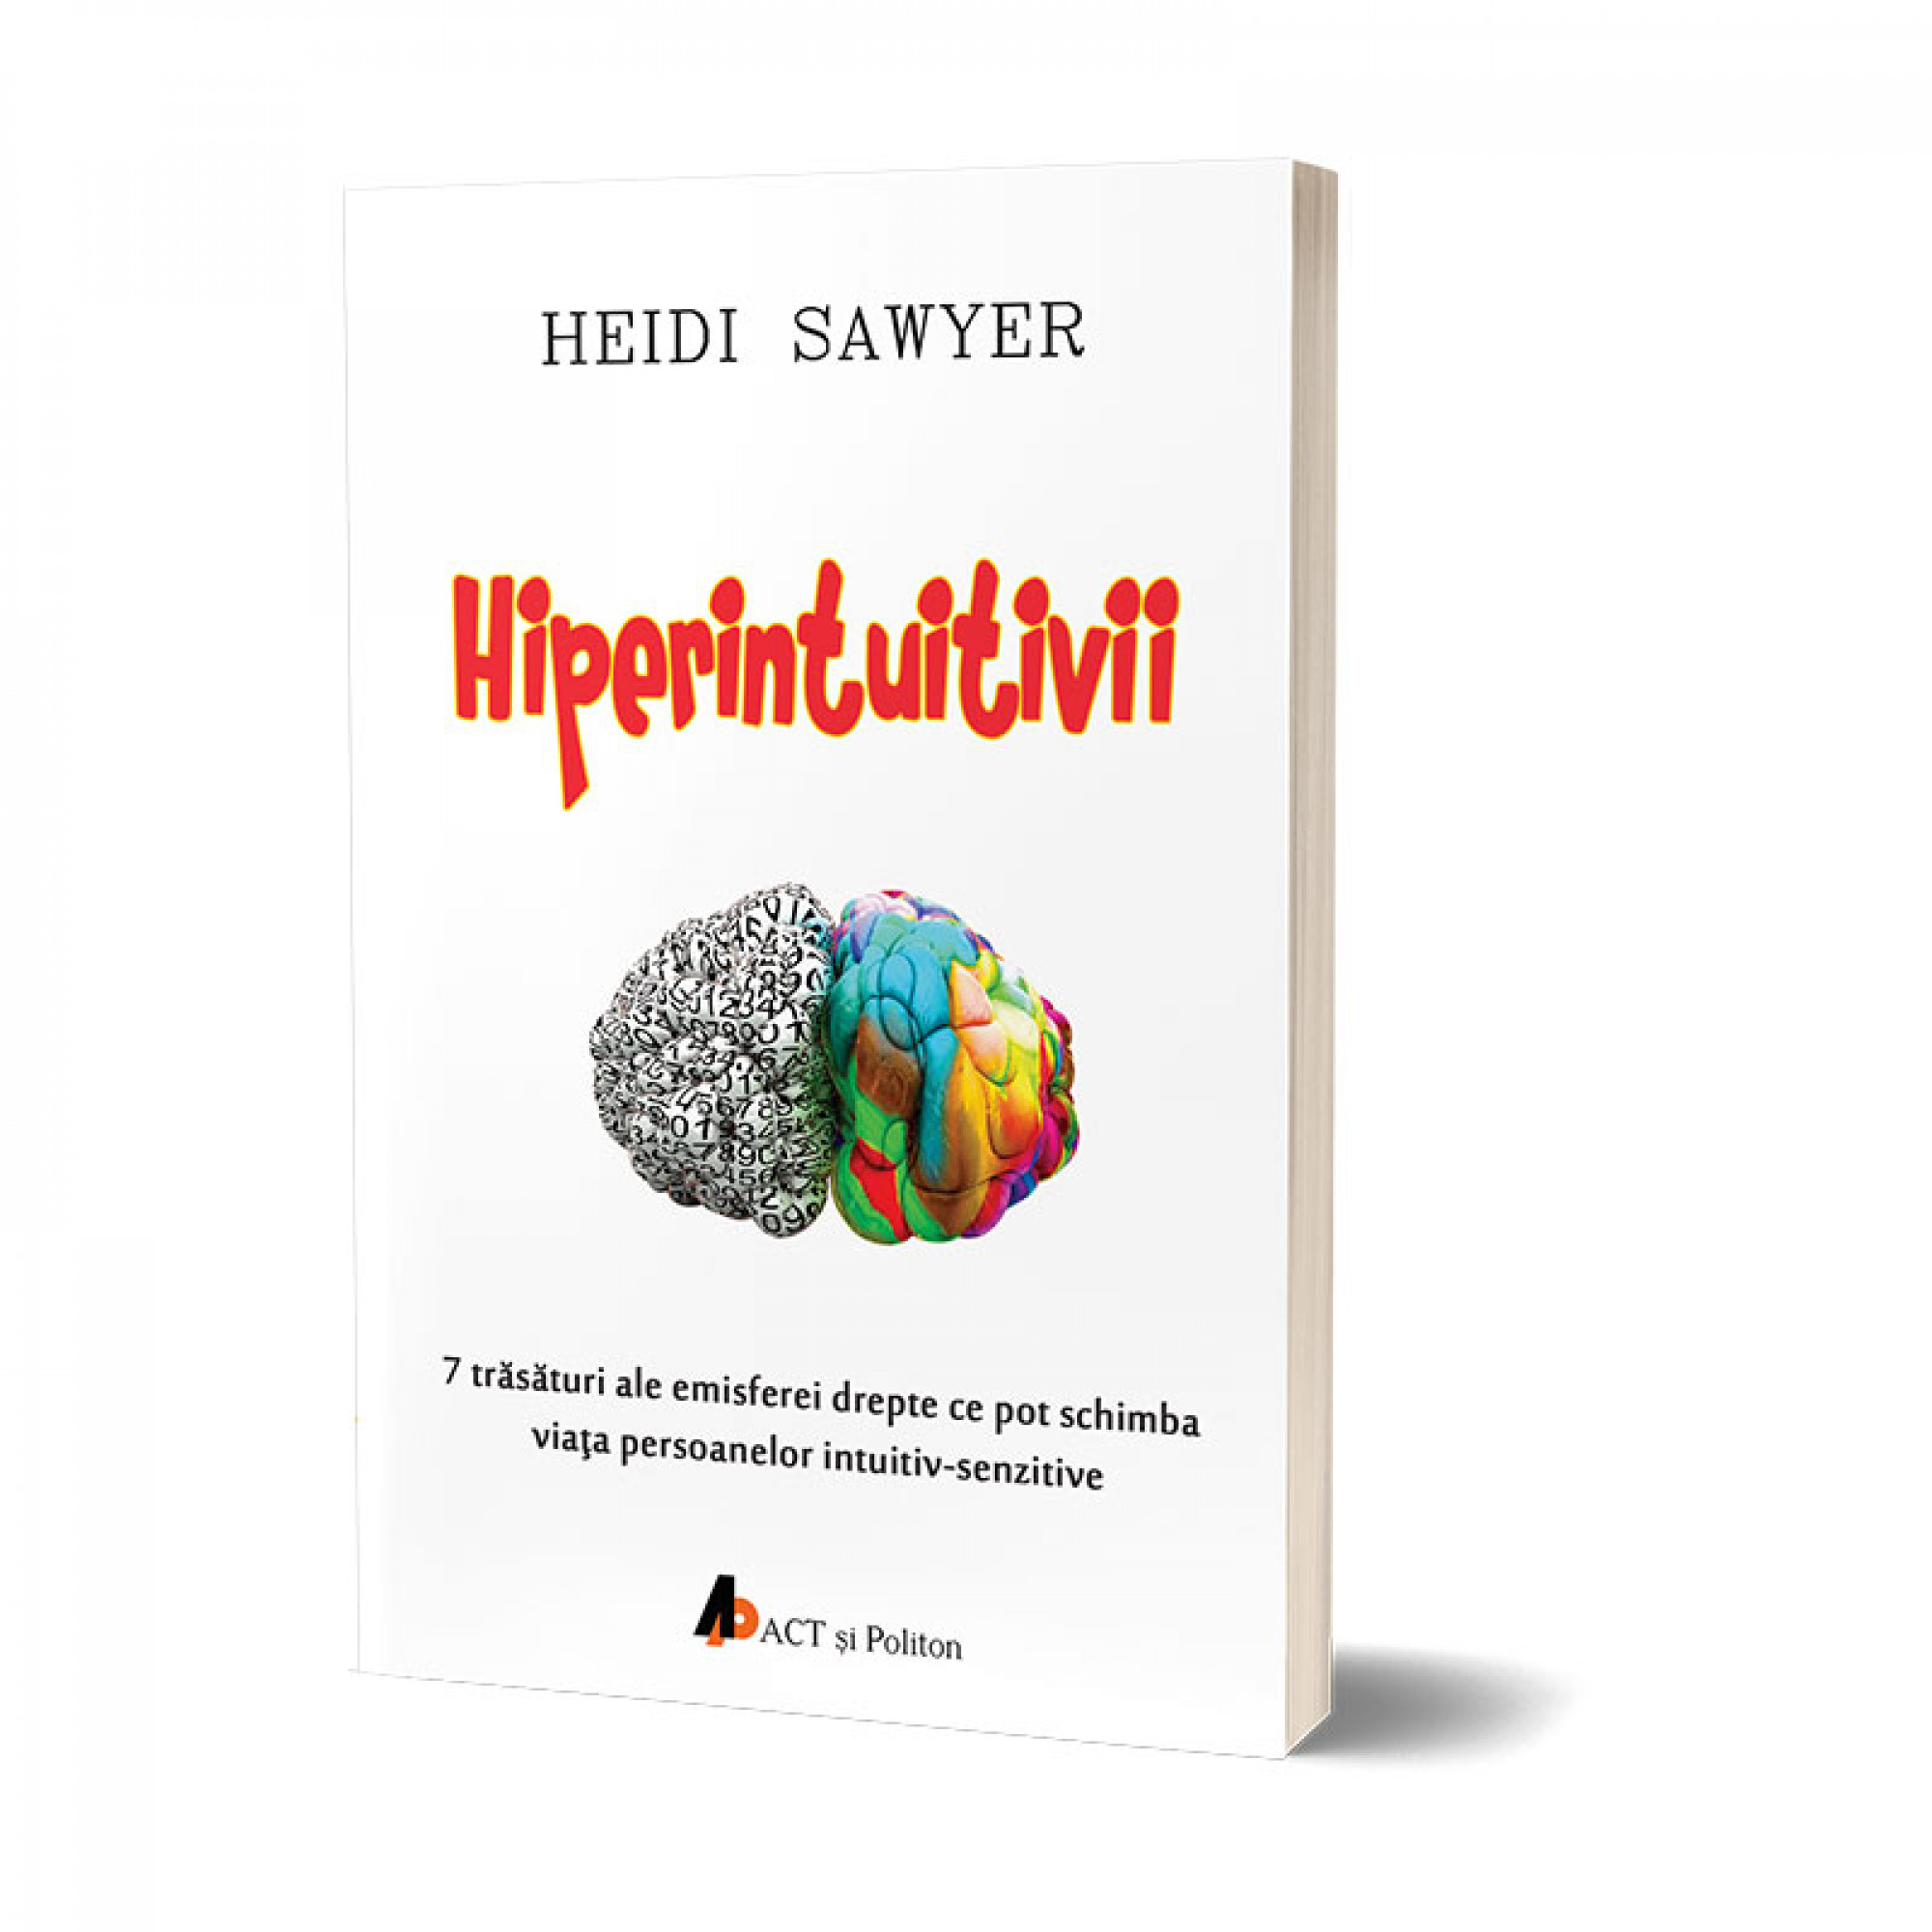 Hiperintuitivii; Heidi Sawyer